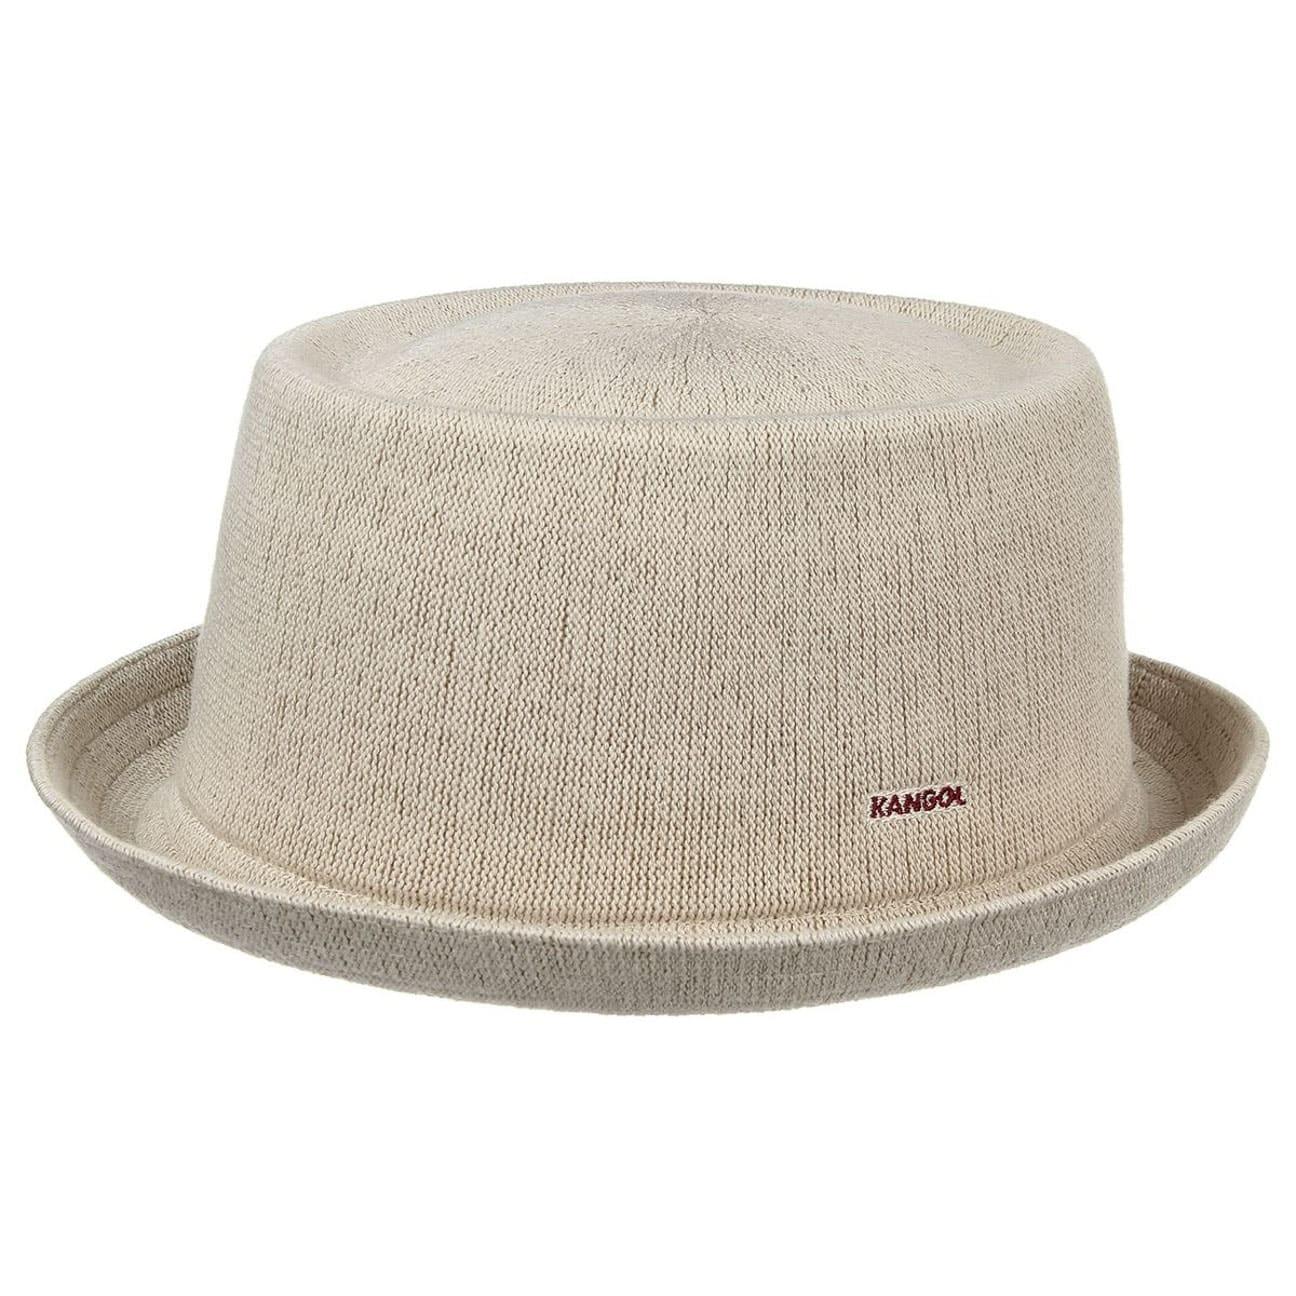 ... Mowbray Pork Pie Hat by Kangol - oatmeal 1 ... 7a8e2286ee4